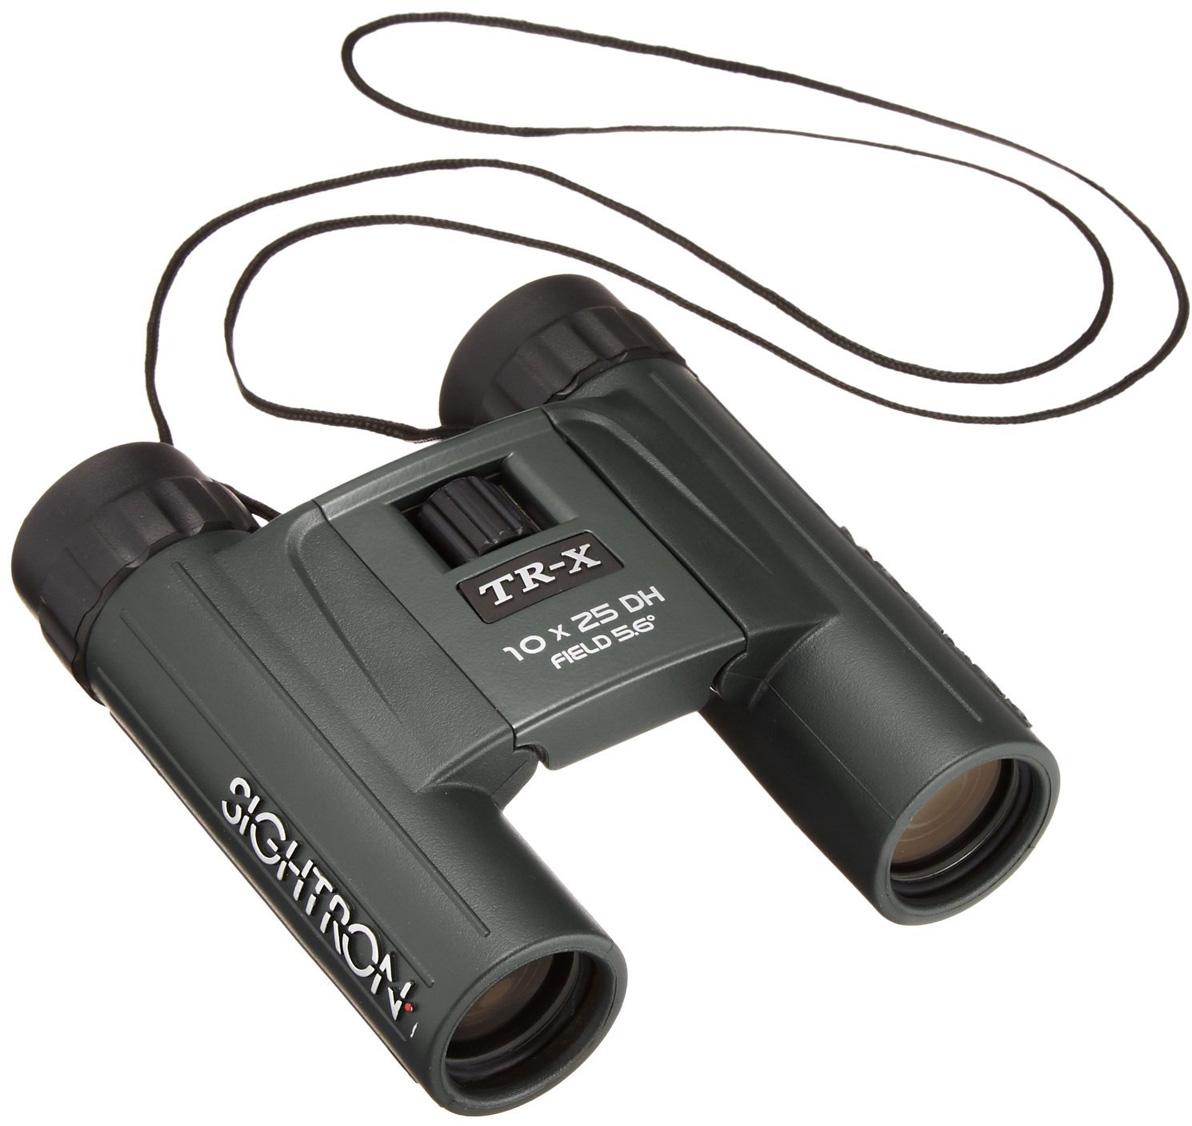 Бинокль Kenko Sightron TR-X 10x25, цвет: черный бинокль sturman 10x25 с термометром